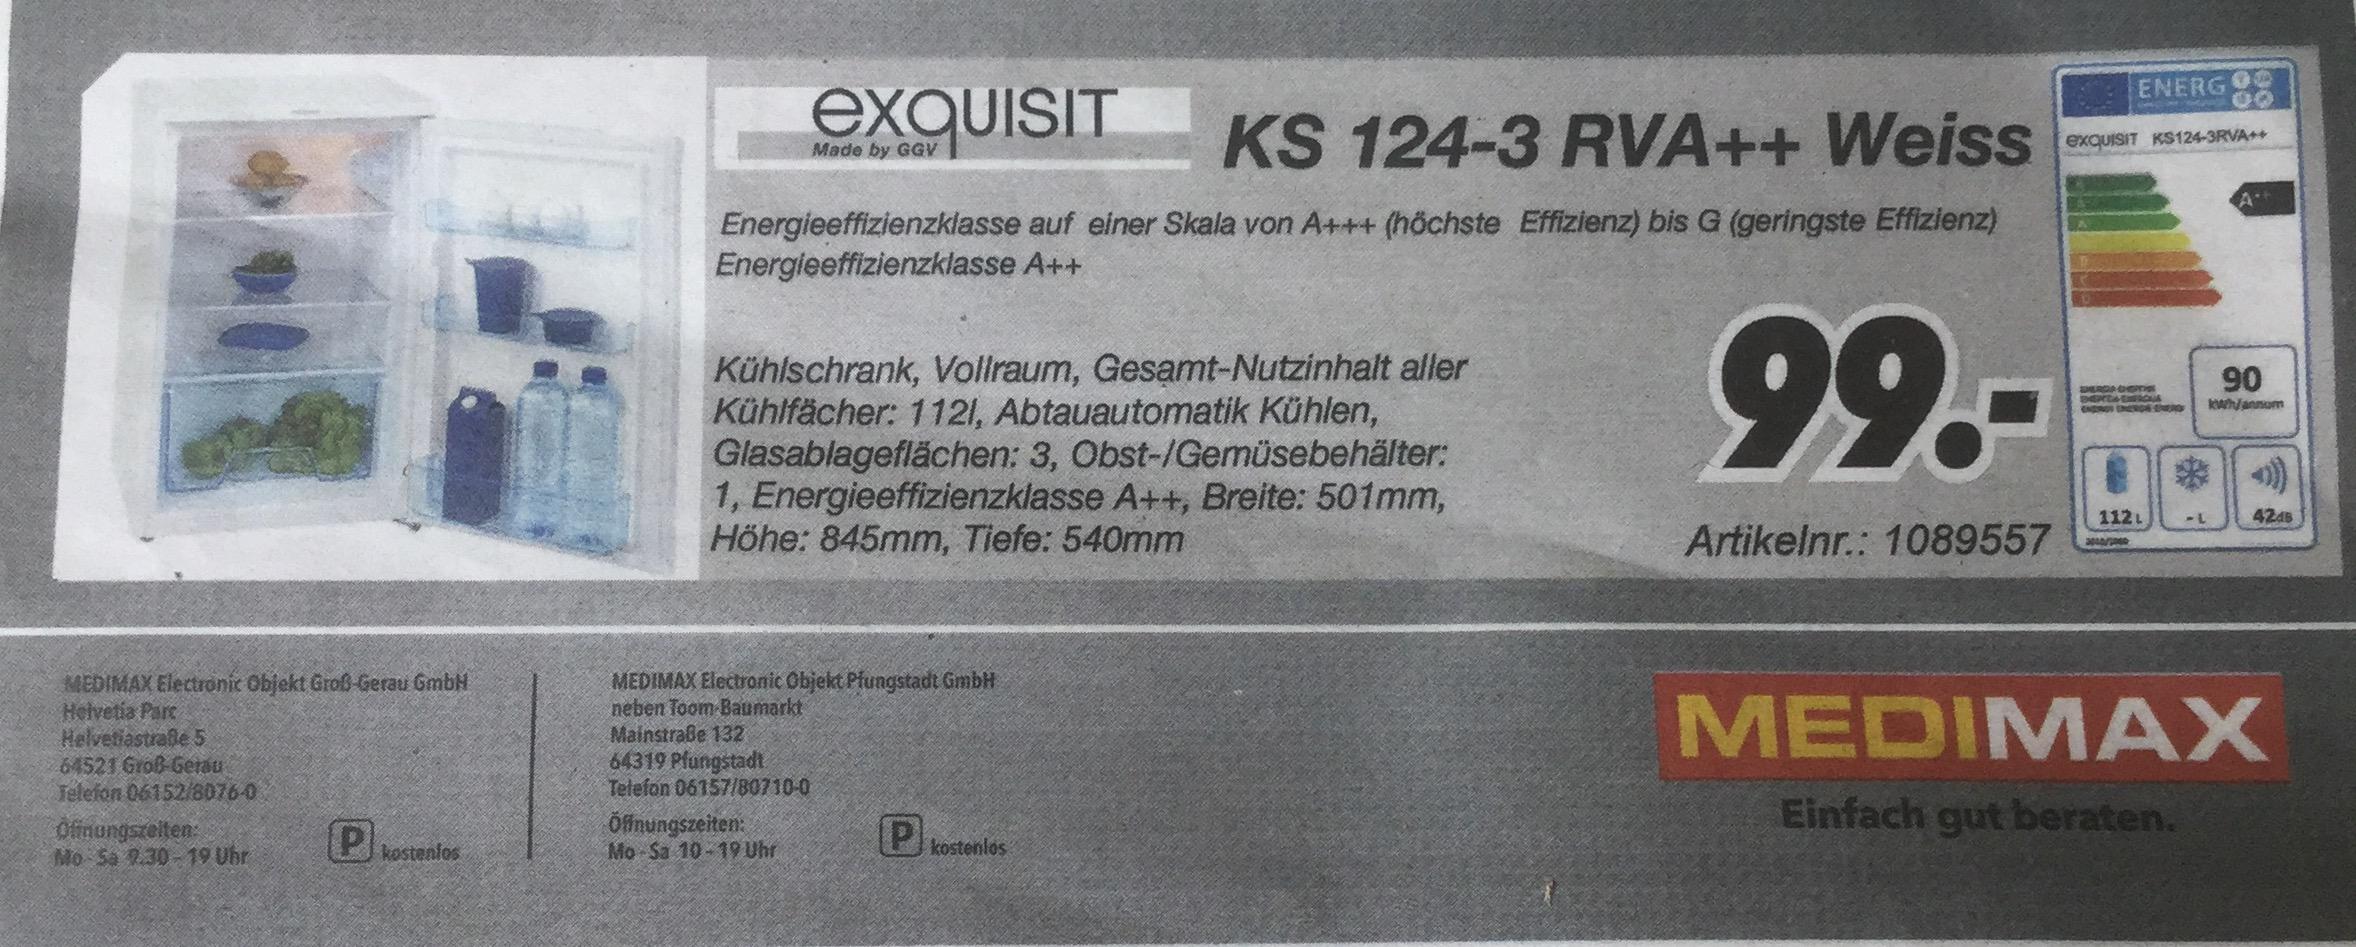 Standkühlschrank Exquisit KS 124-3 RVA++ Idealo 149.-€ (Lokal Gross-Gerau)